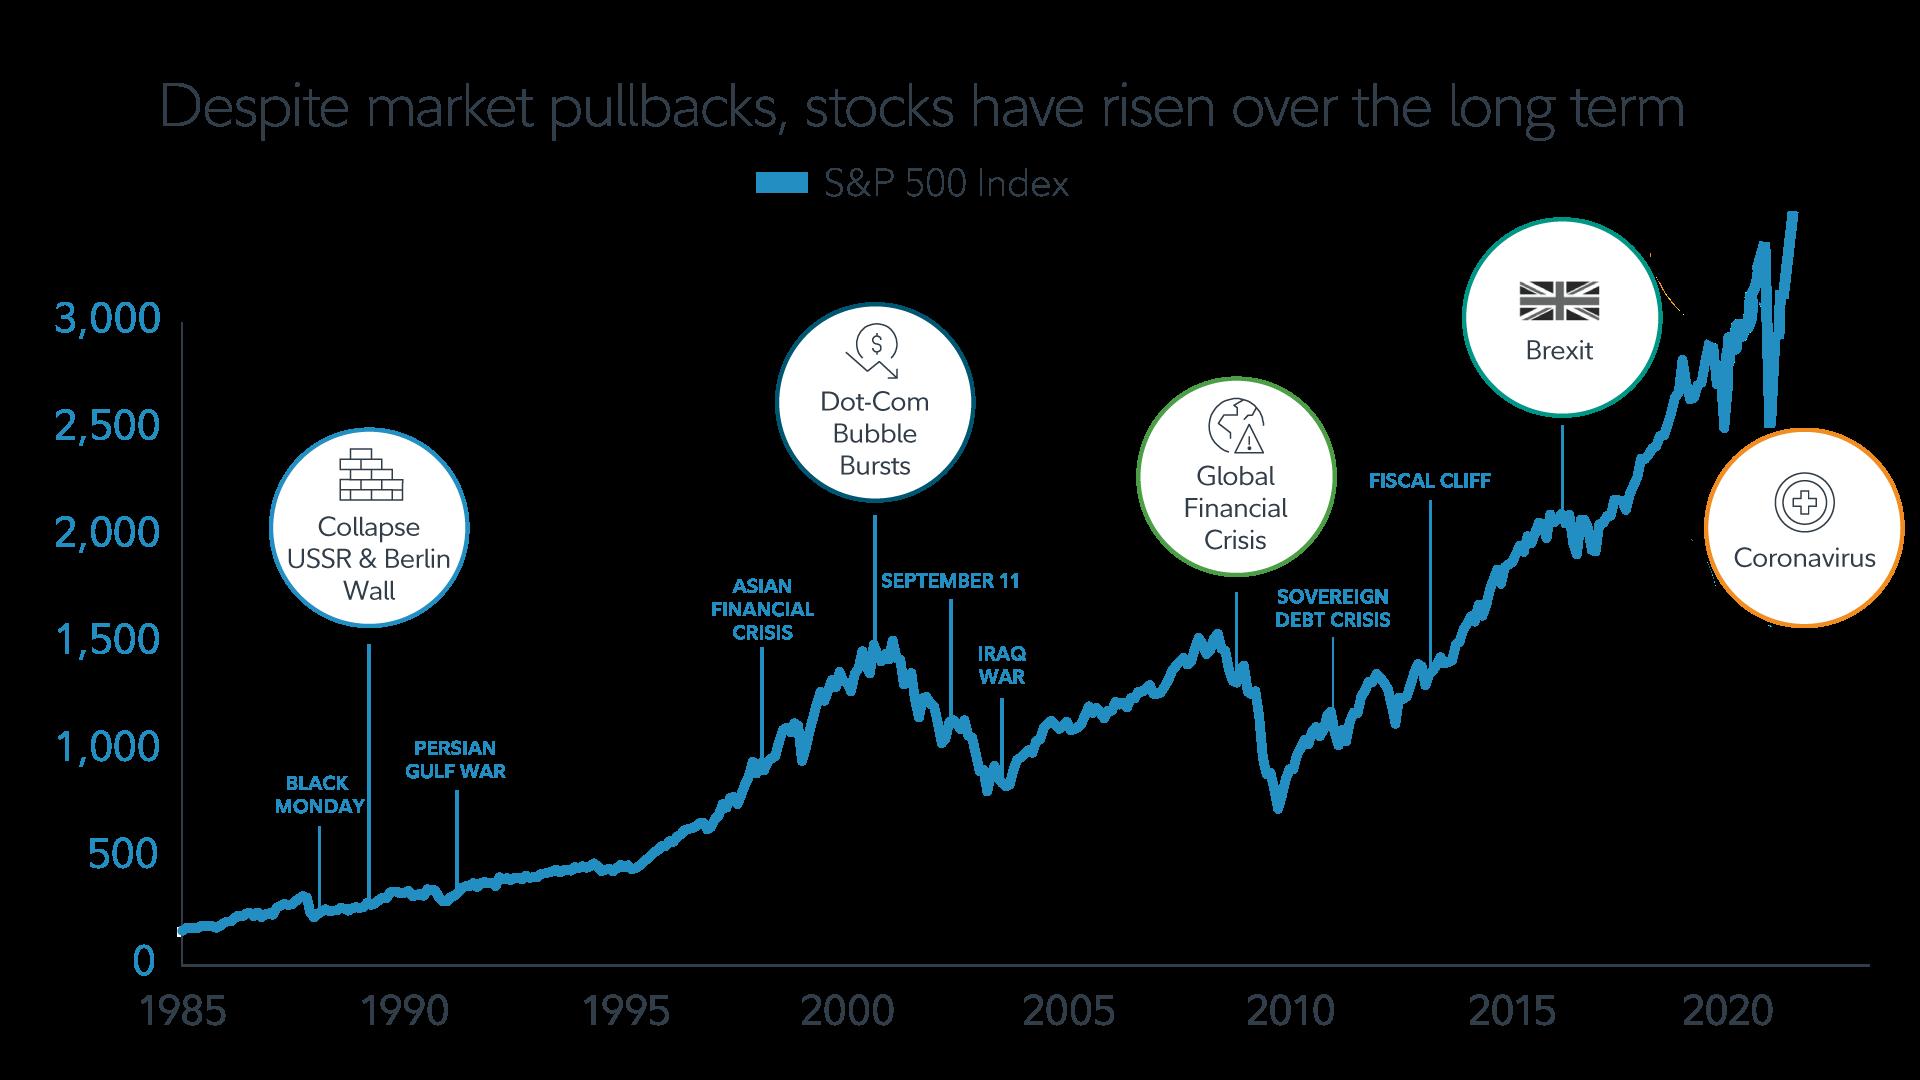 S&P500 bull e bear market